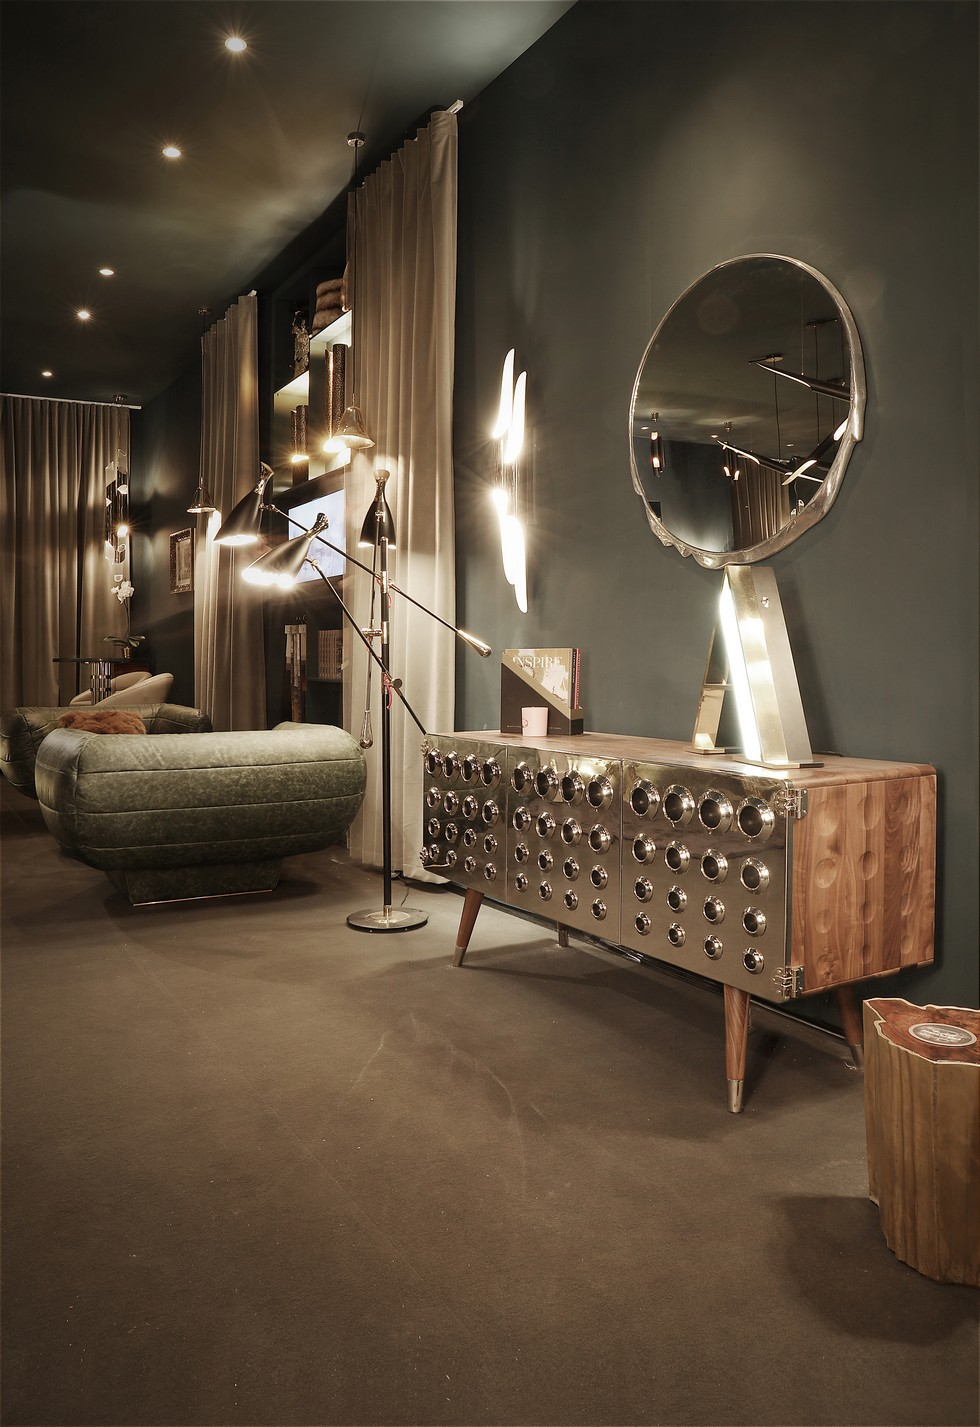 Salone del Mobile 2017 Salone del Mobile 2017 – design trends at Hall 1 and 3 Covet Lounge 2